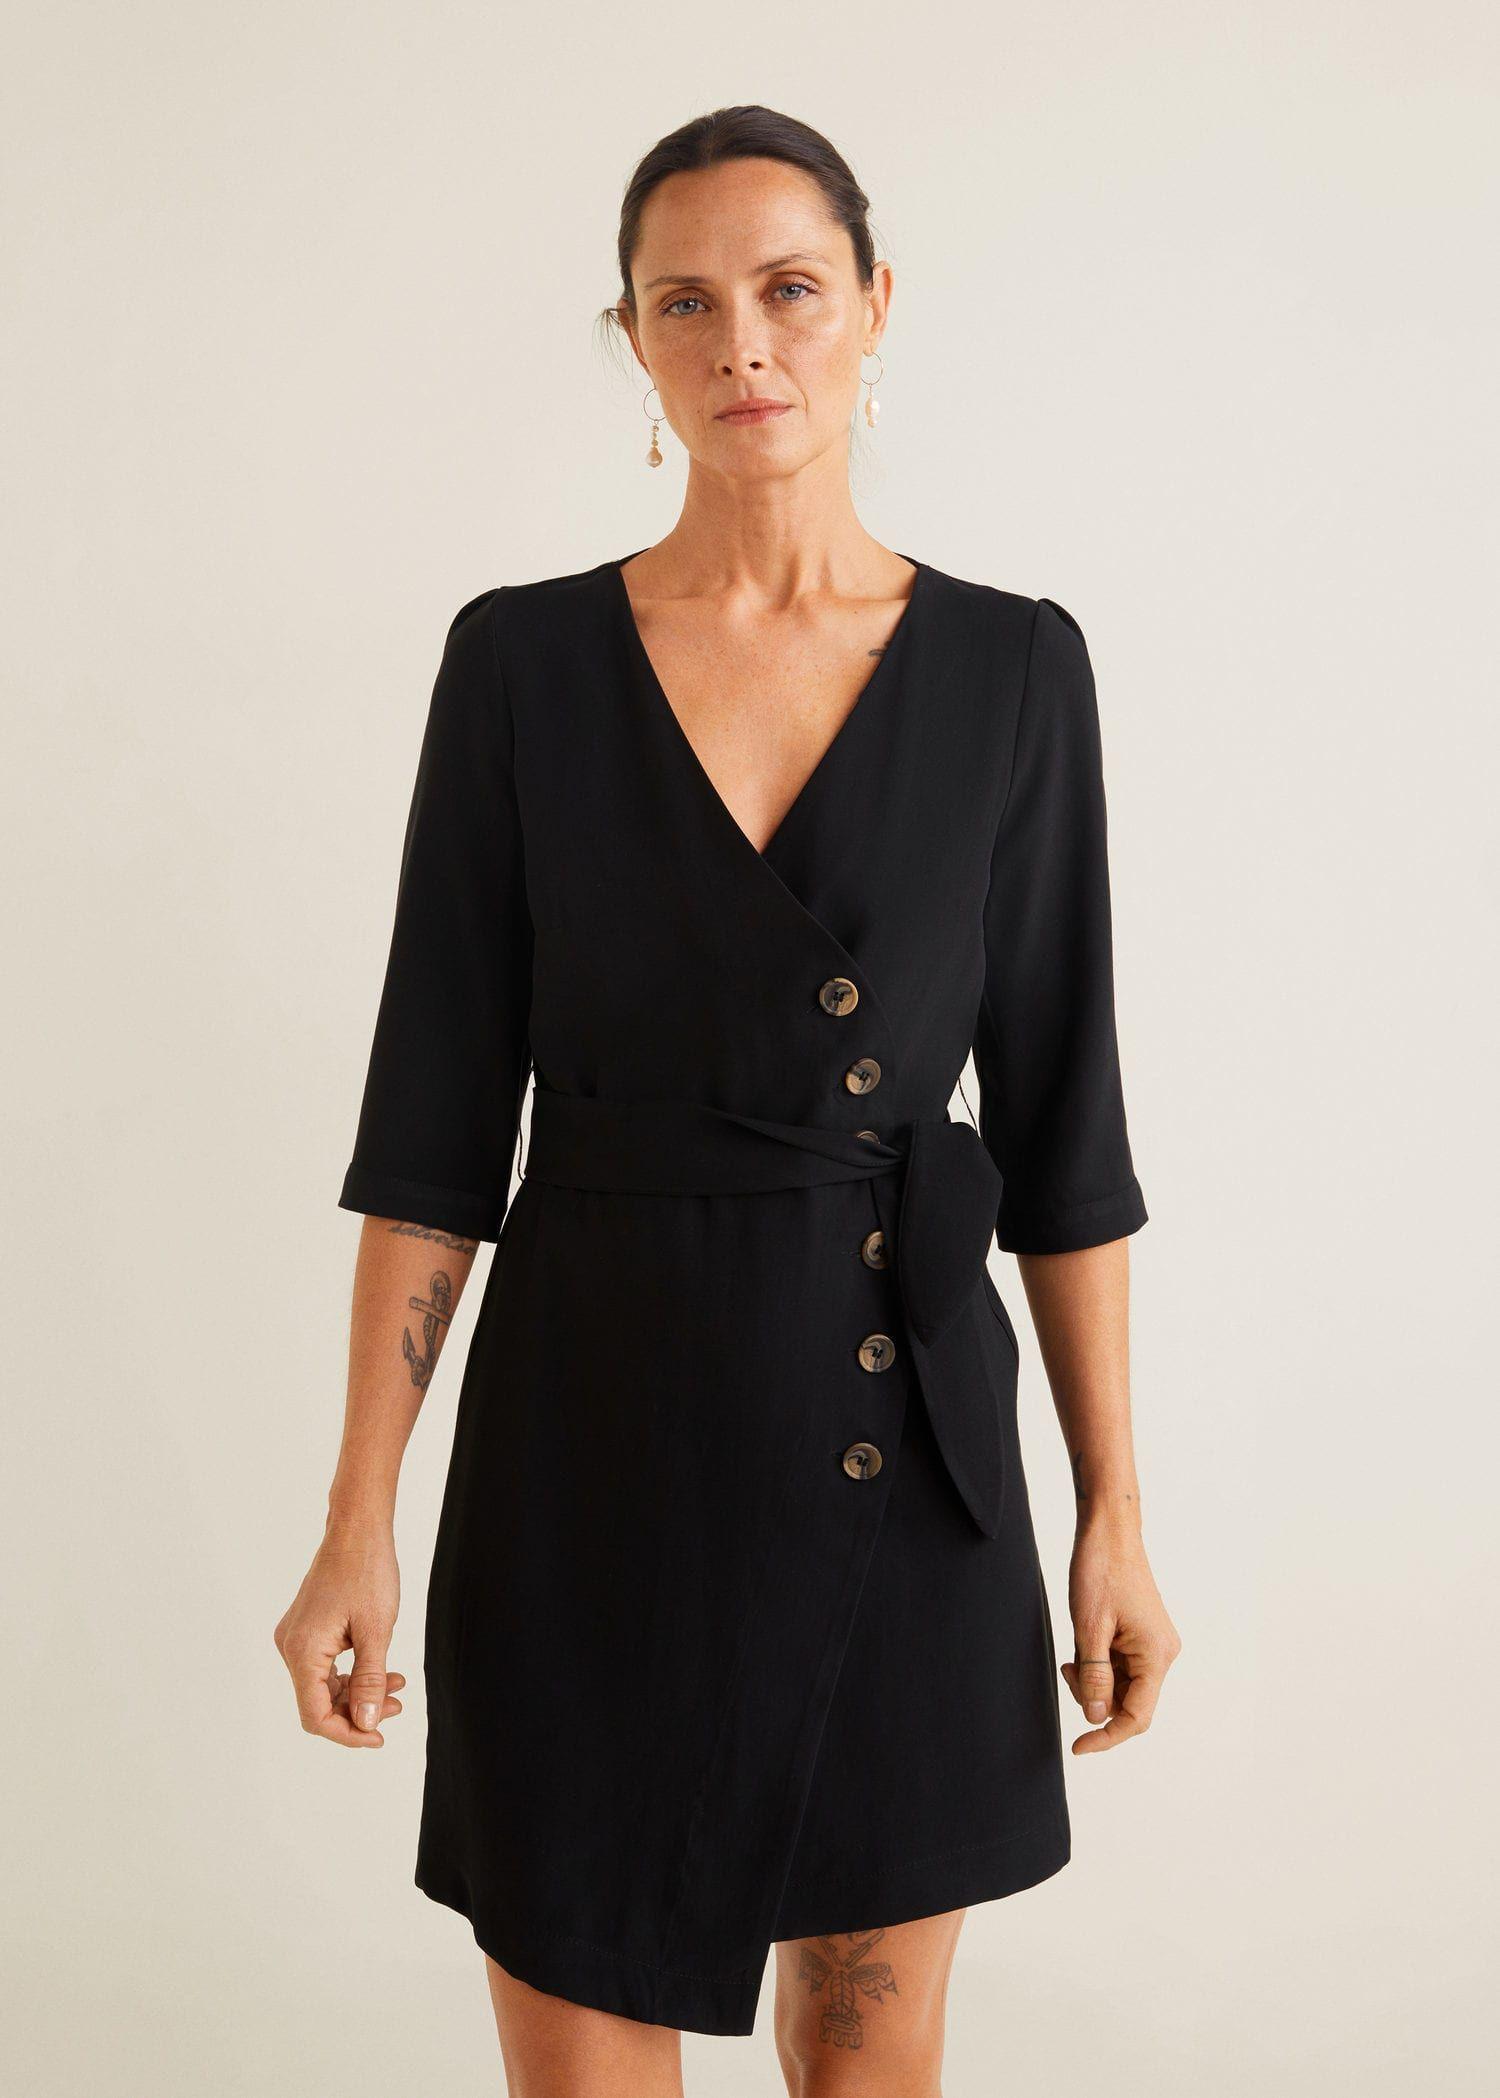 1acc1373f5 Buttoned wrap dress - Women in 2019 | actually want | Wrap dress ...